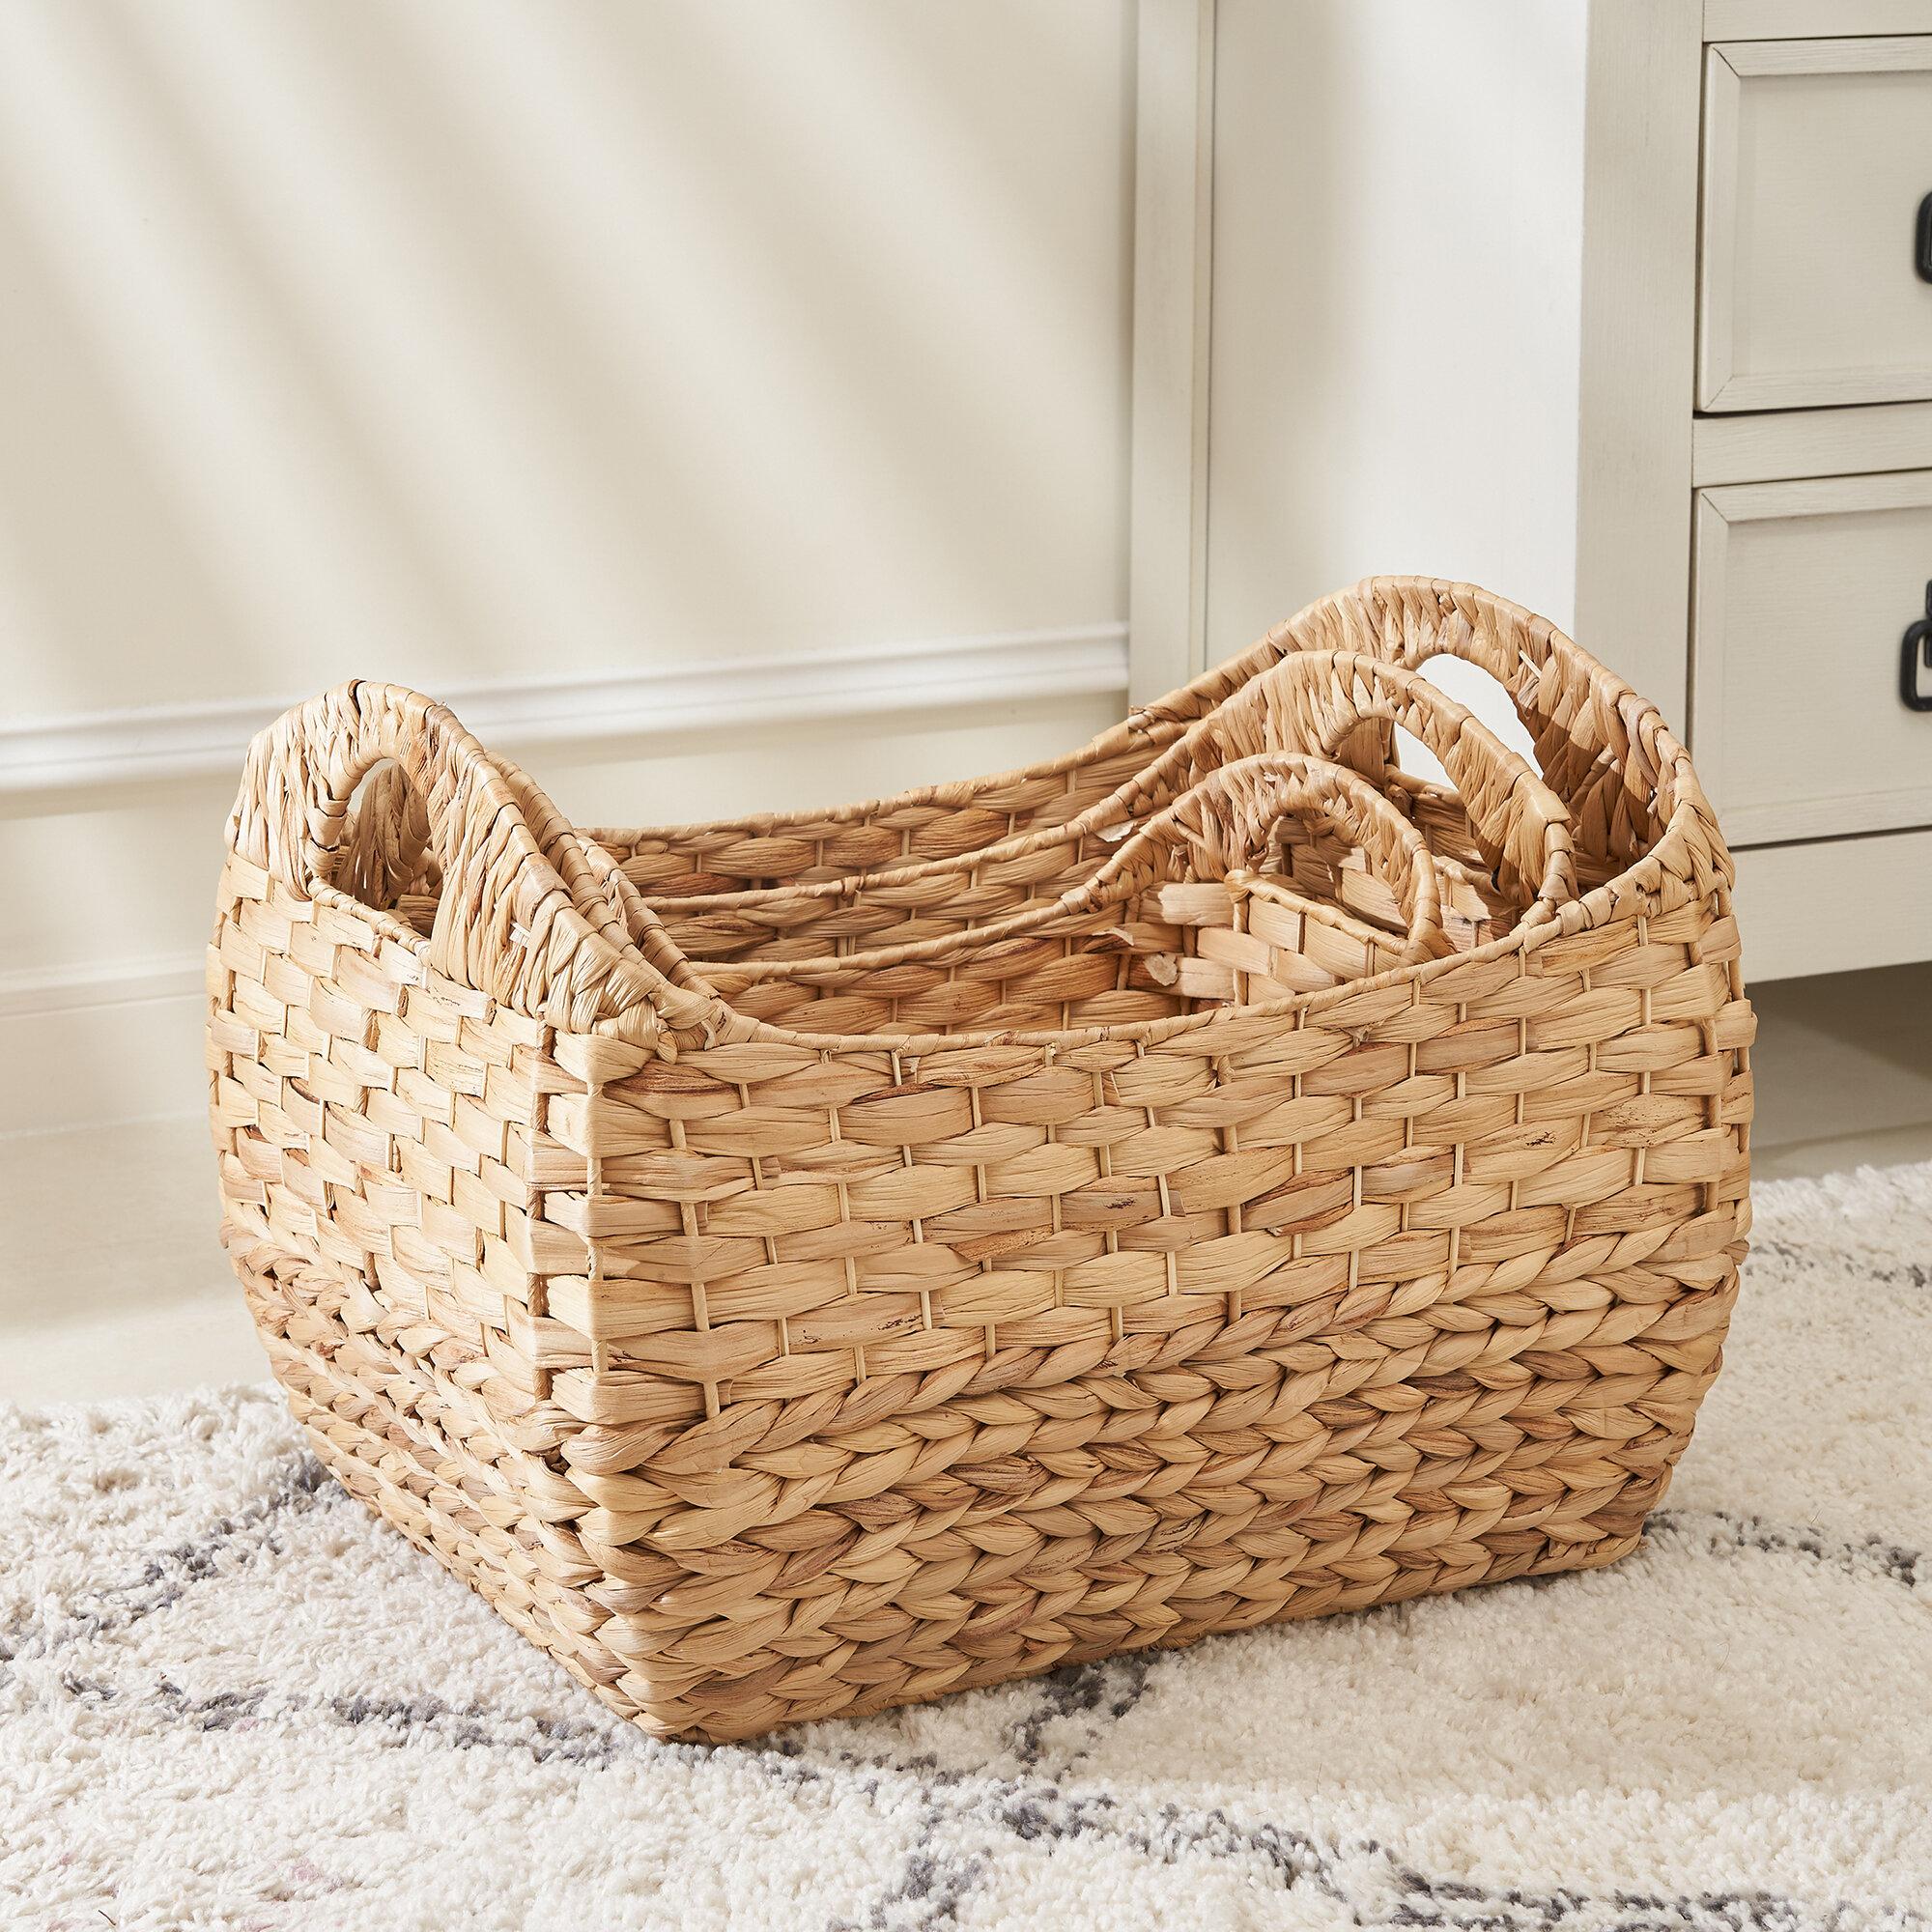 Dovecove Amelia 3 Piece Wicker Basket Set Reviews Wayfair